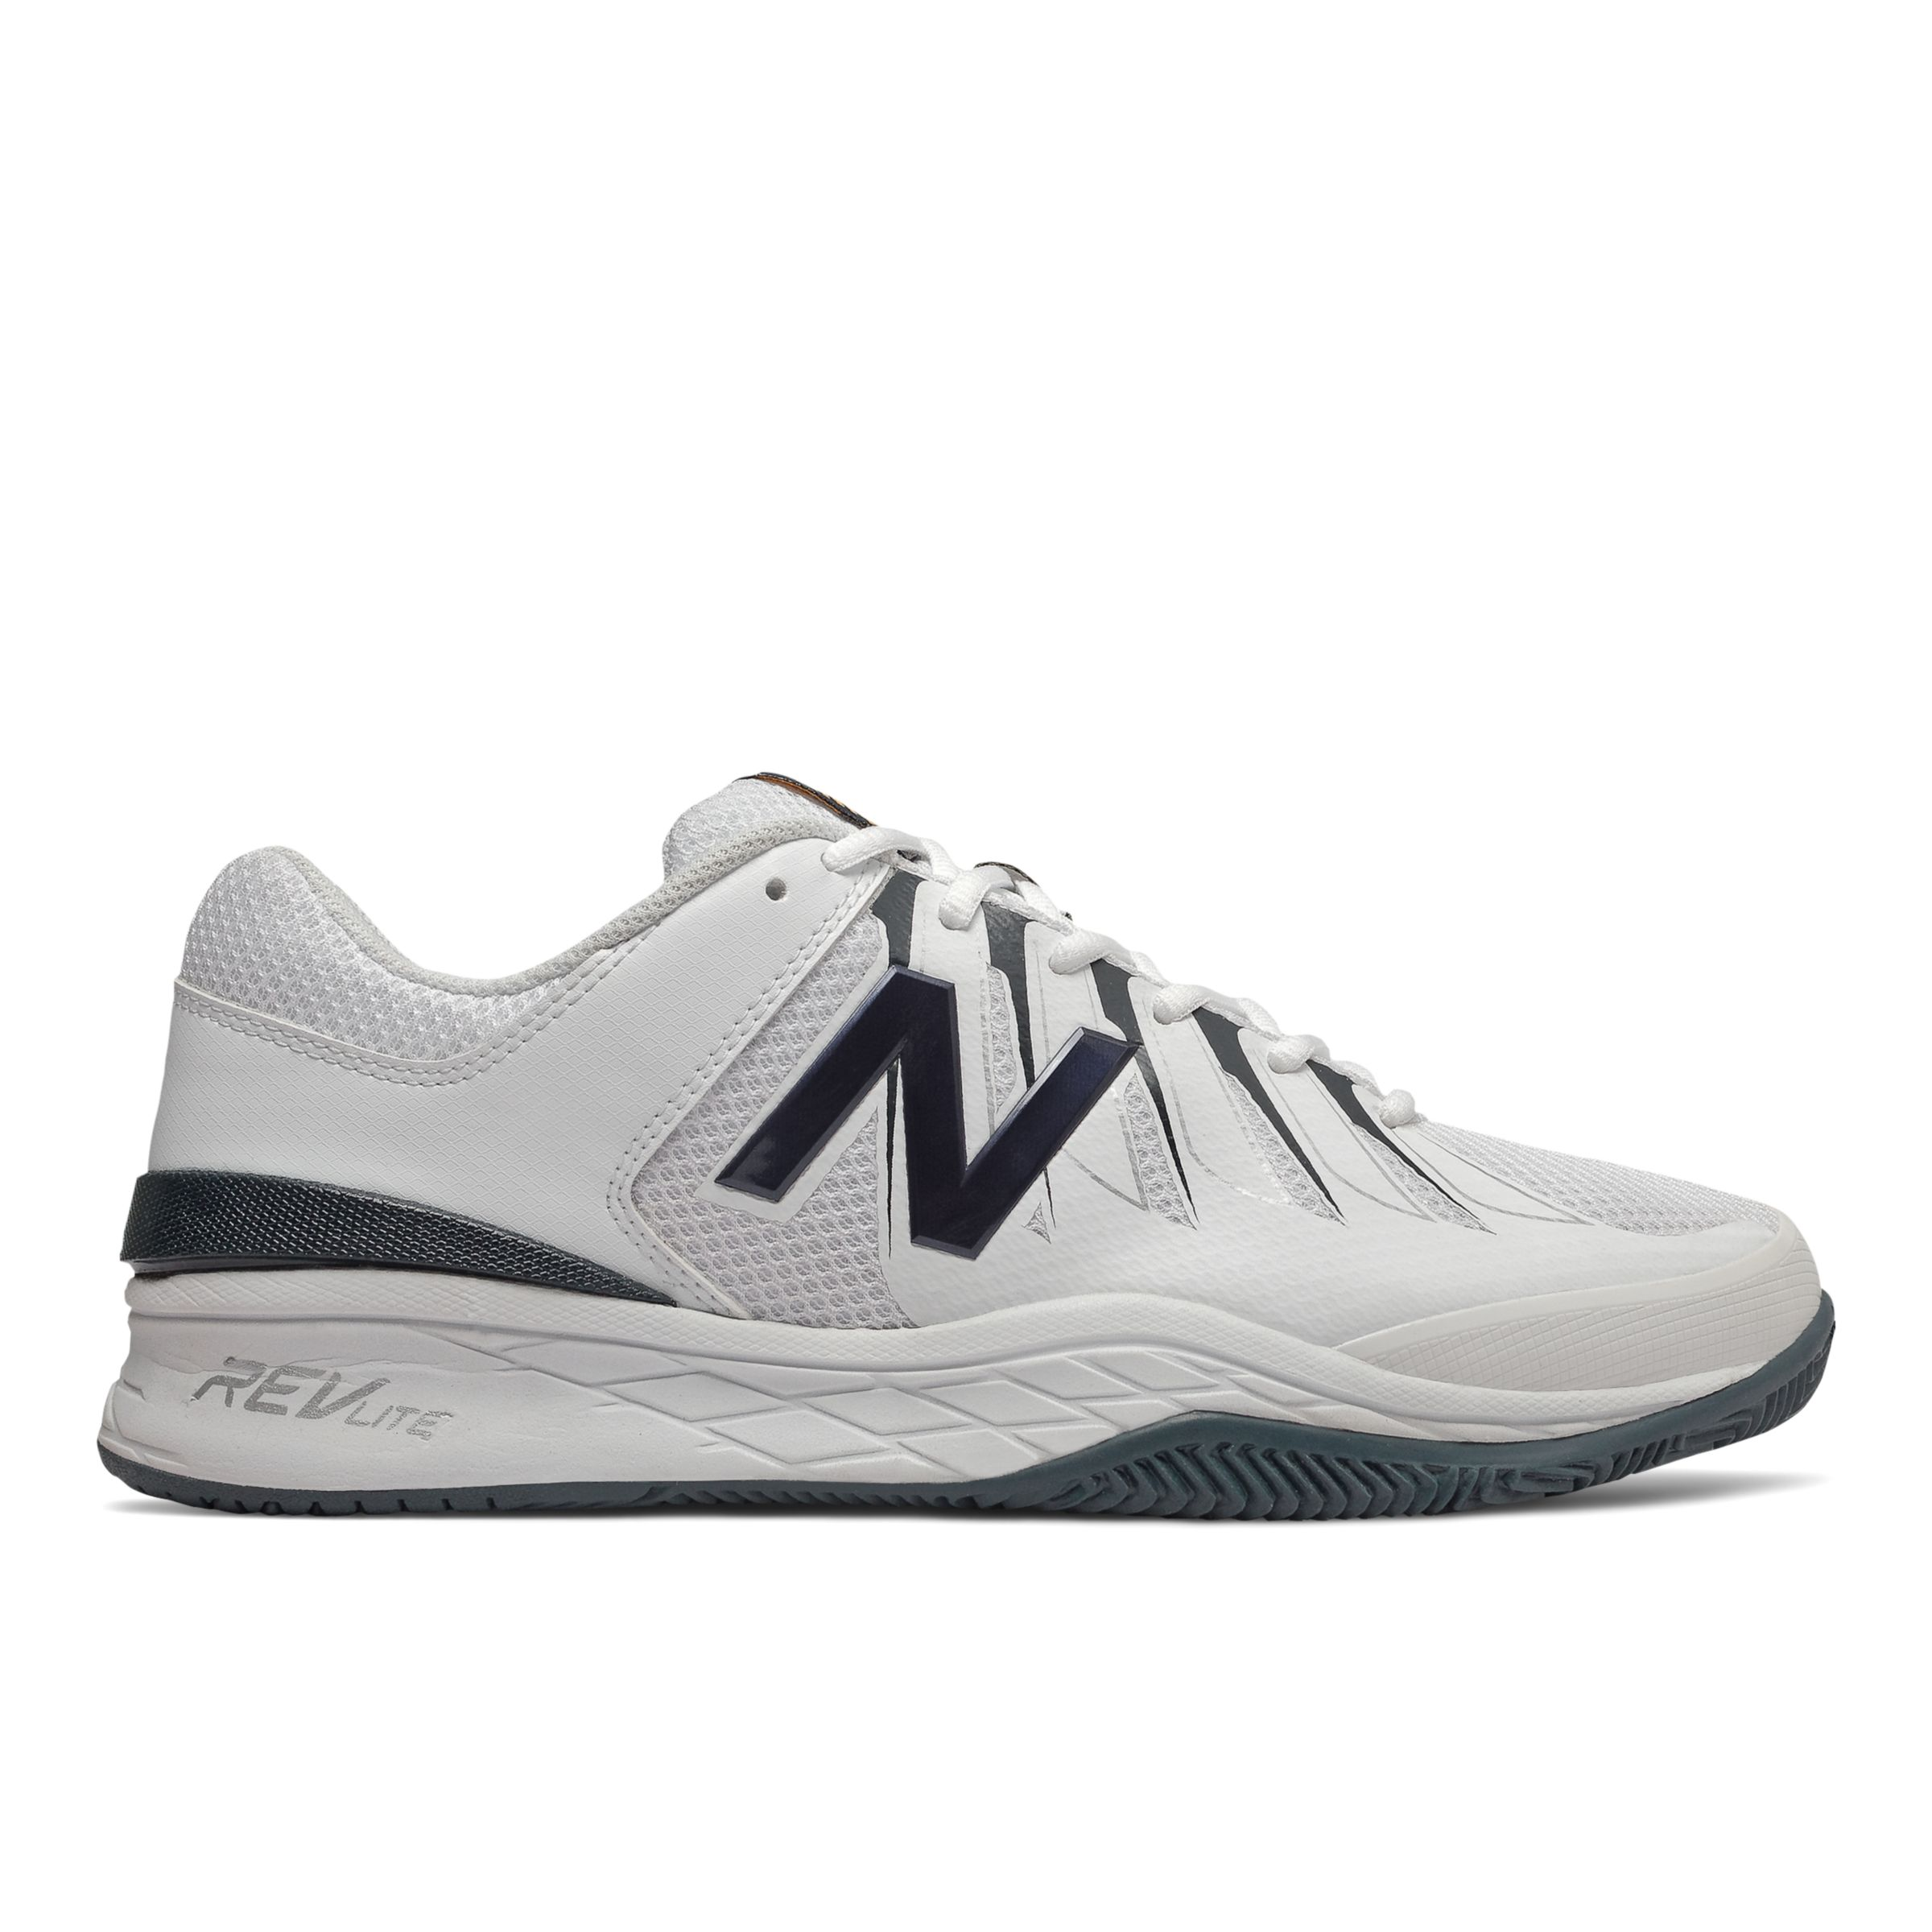 mens new balance tennis shoes